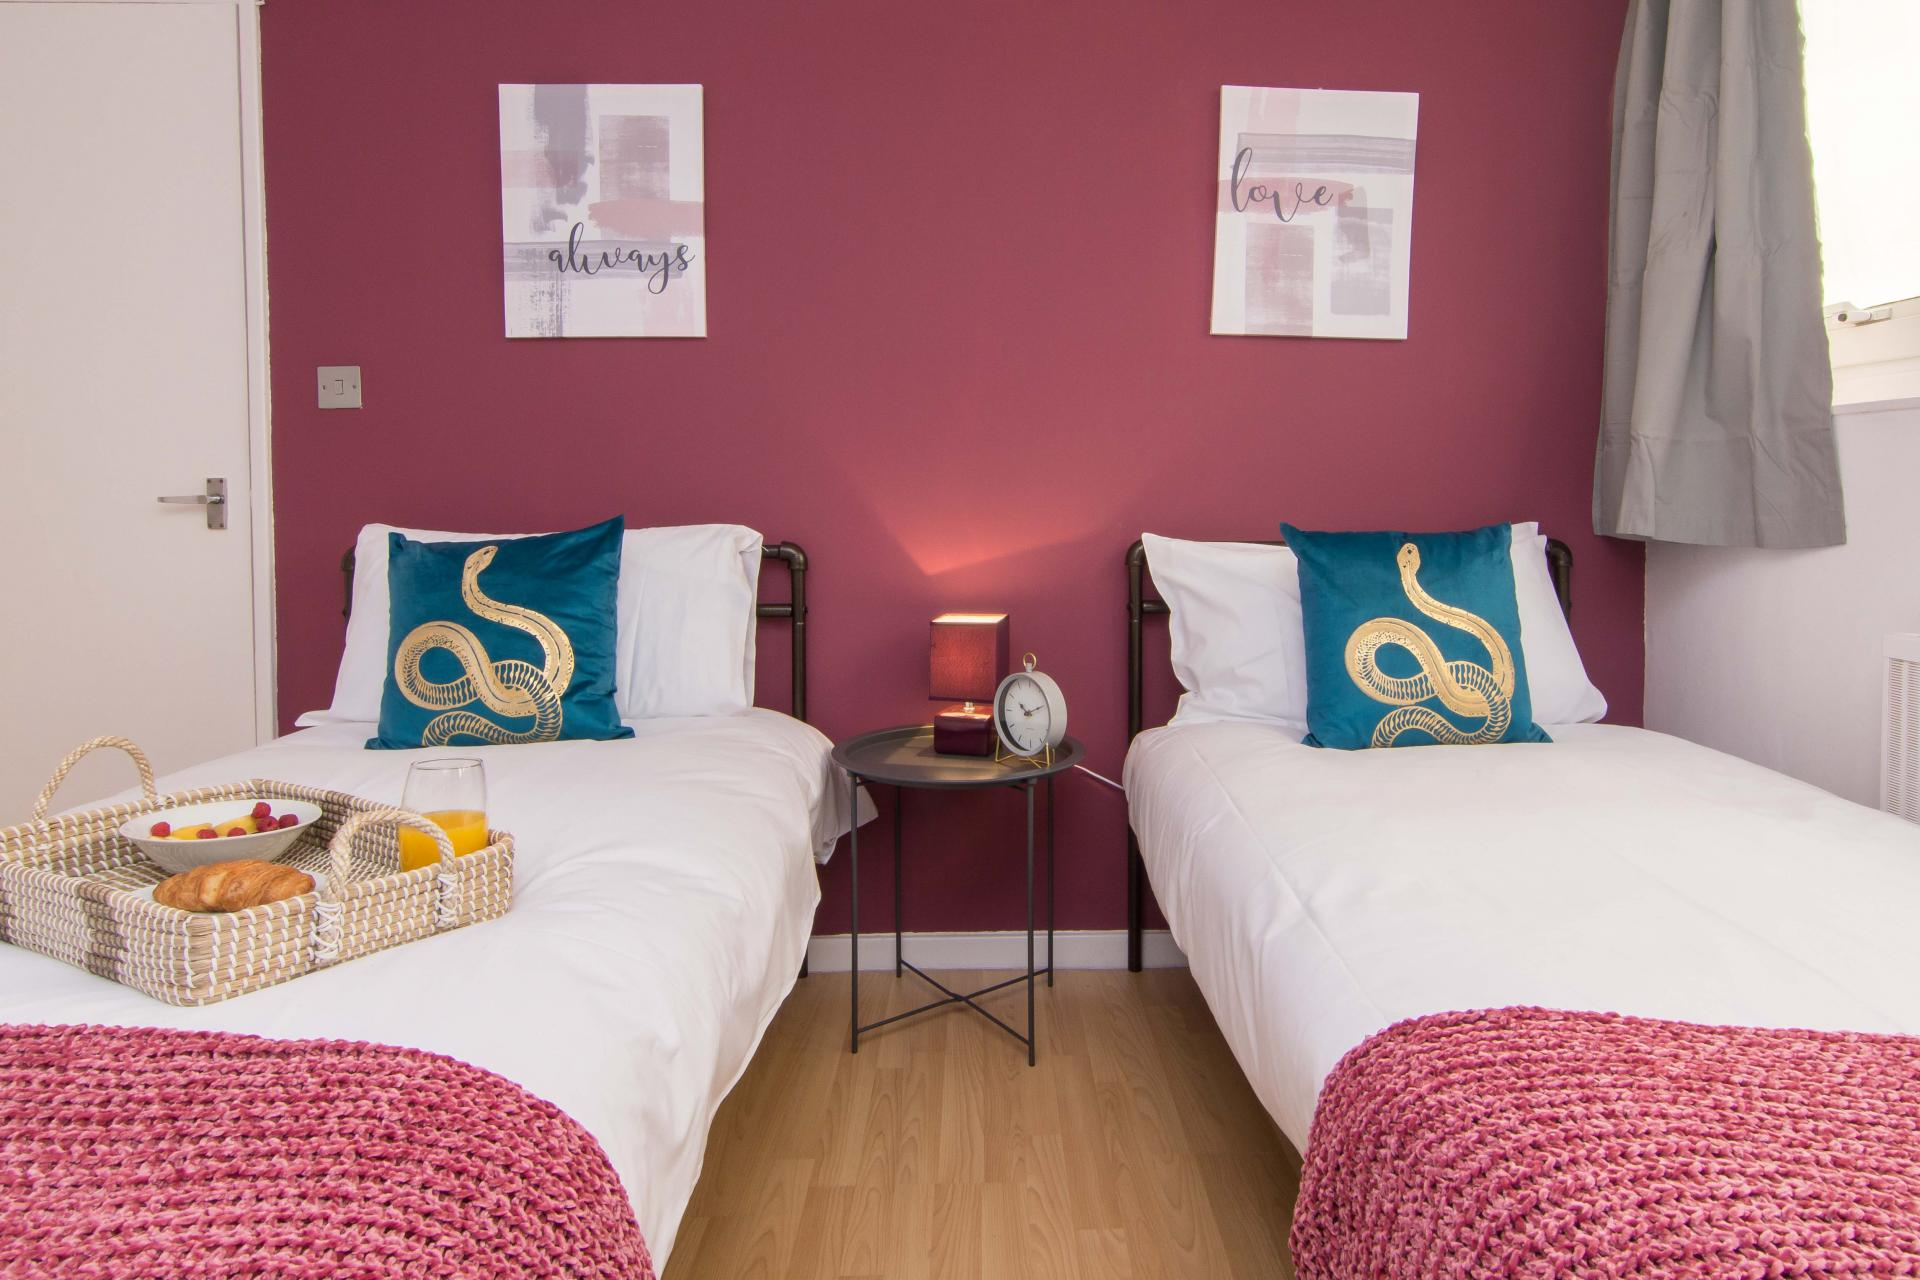 Twin beds at Victoria Centre Apartment, Centre, Nottingham - Citybase Apartments